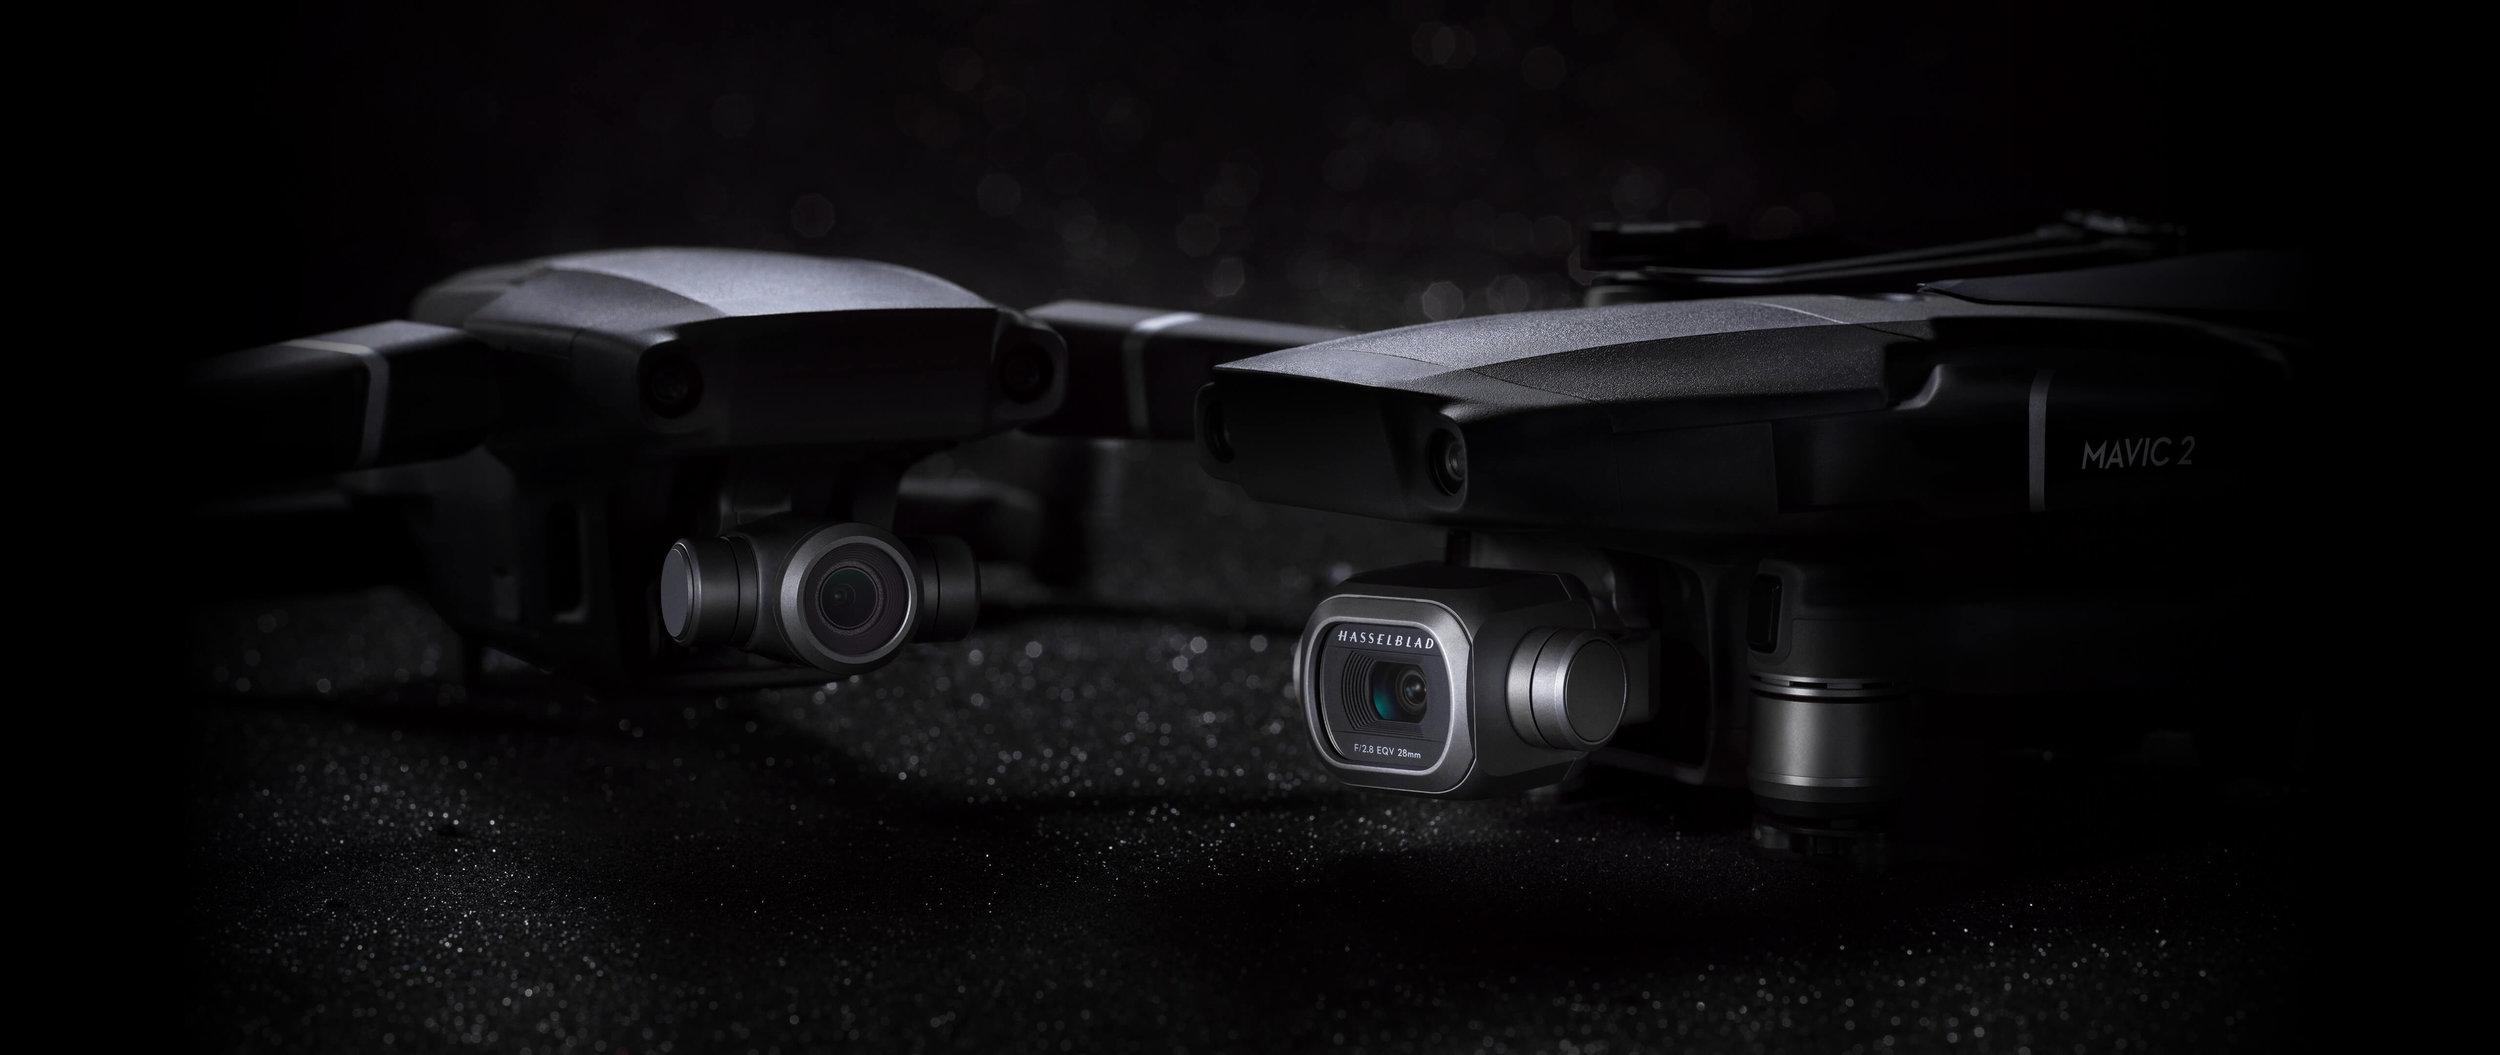 drone-video-production-orange-county.jpg